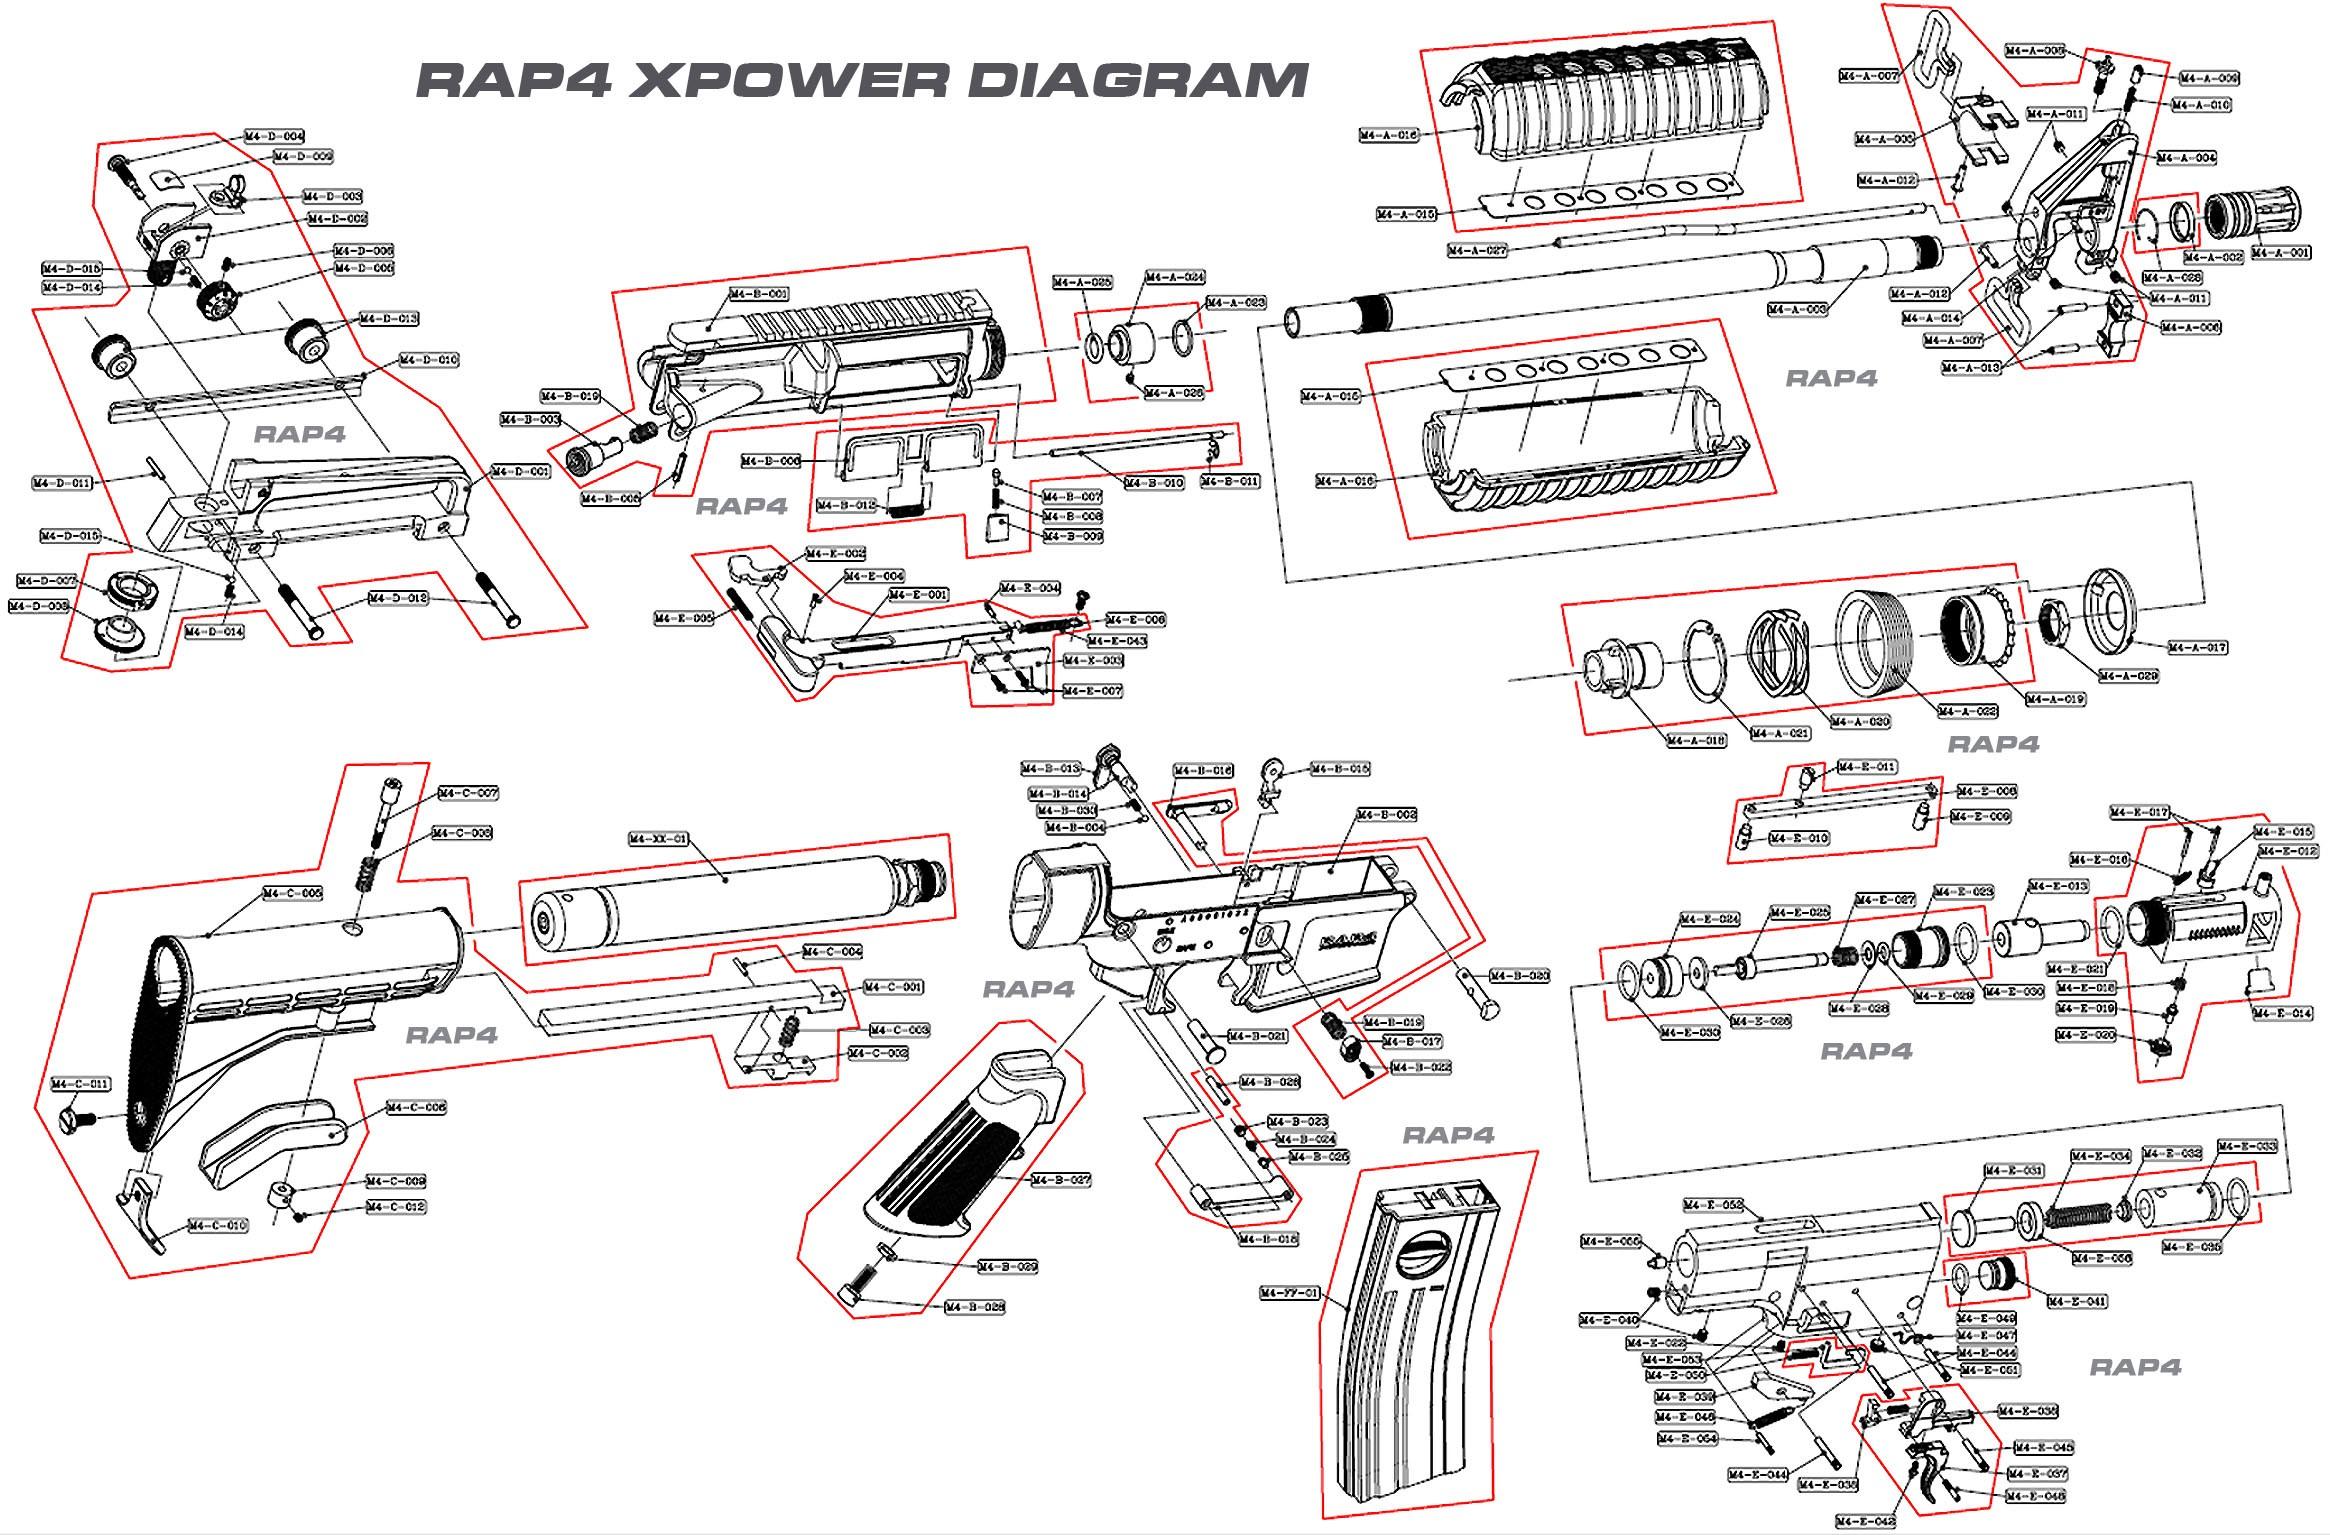 Names Of Car Parts Diagram M4 Carbine Schematic Military Pinterest Of Names Of Car Parts Diagram